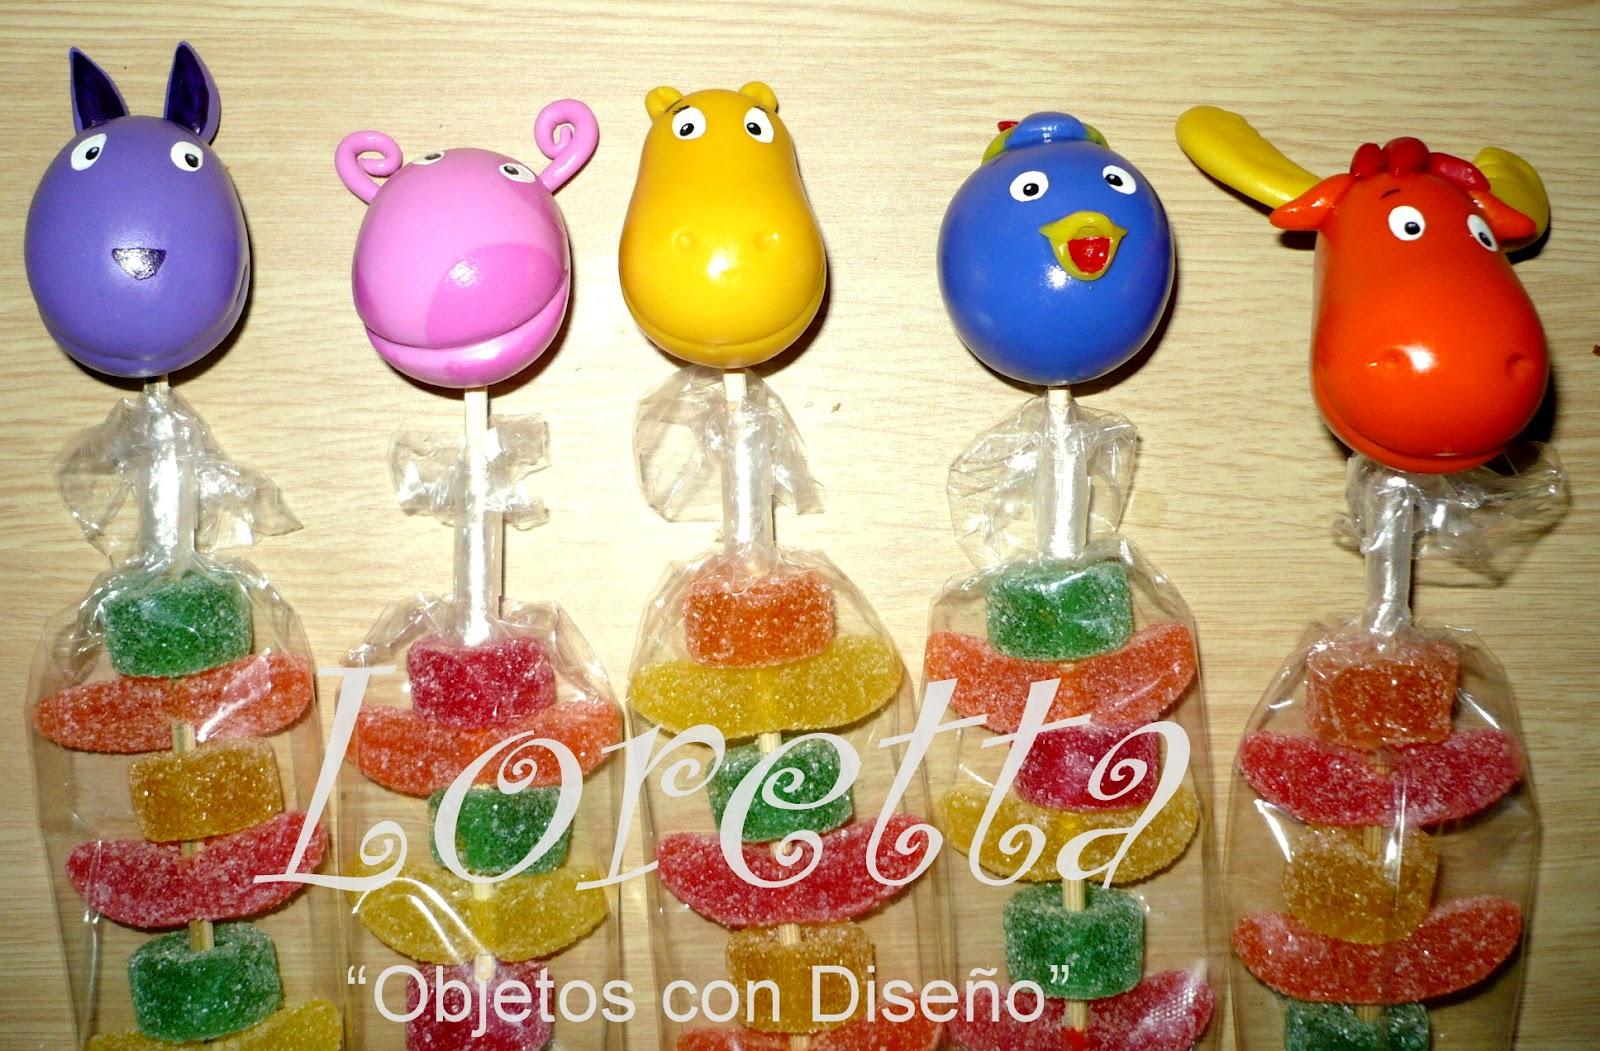 Loretta objetos con dise o decoraci n tem tica - Objetos decoracion diseno ...